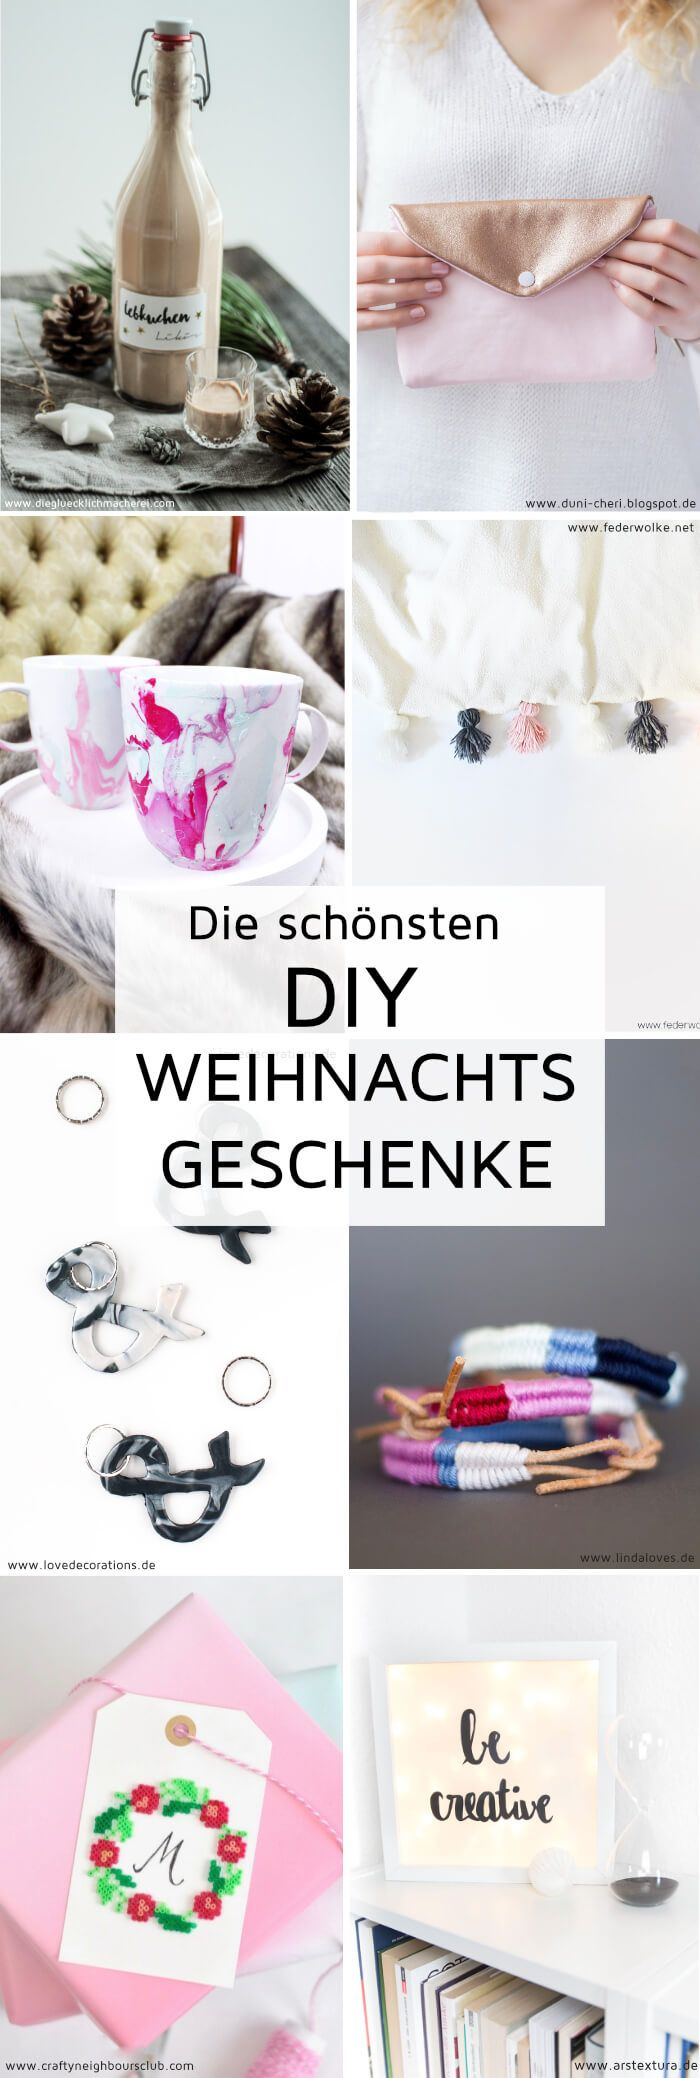 Photo of DIY Weihnachtsgeschenke selber machen: 8 kreative DIY Ideen